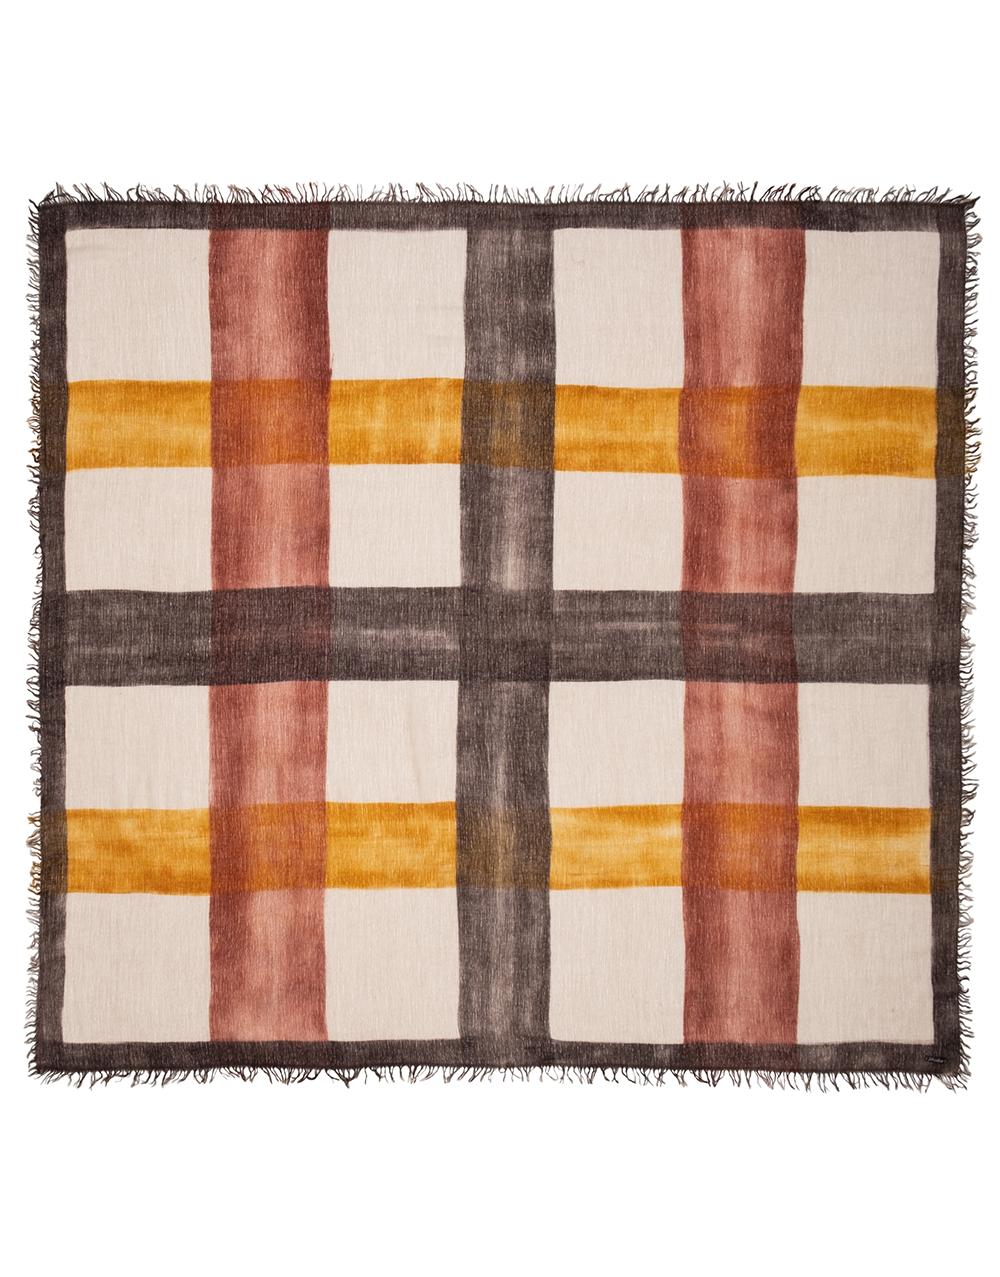 Mercury scarf ocre brown orange square